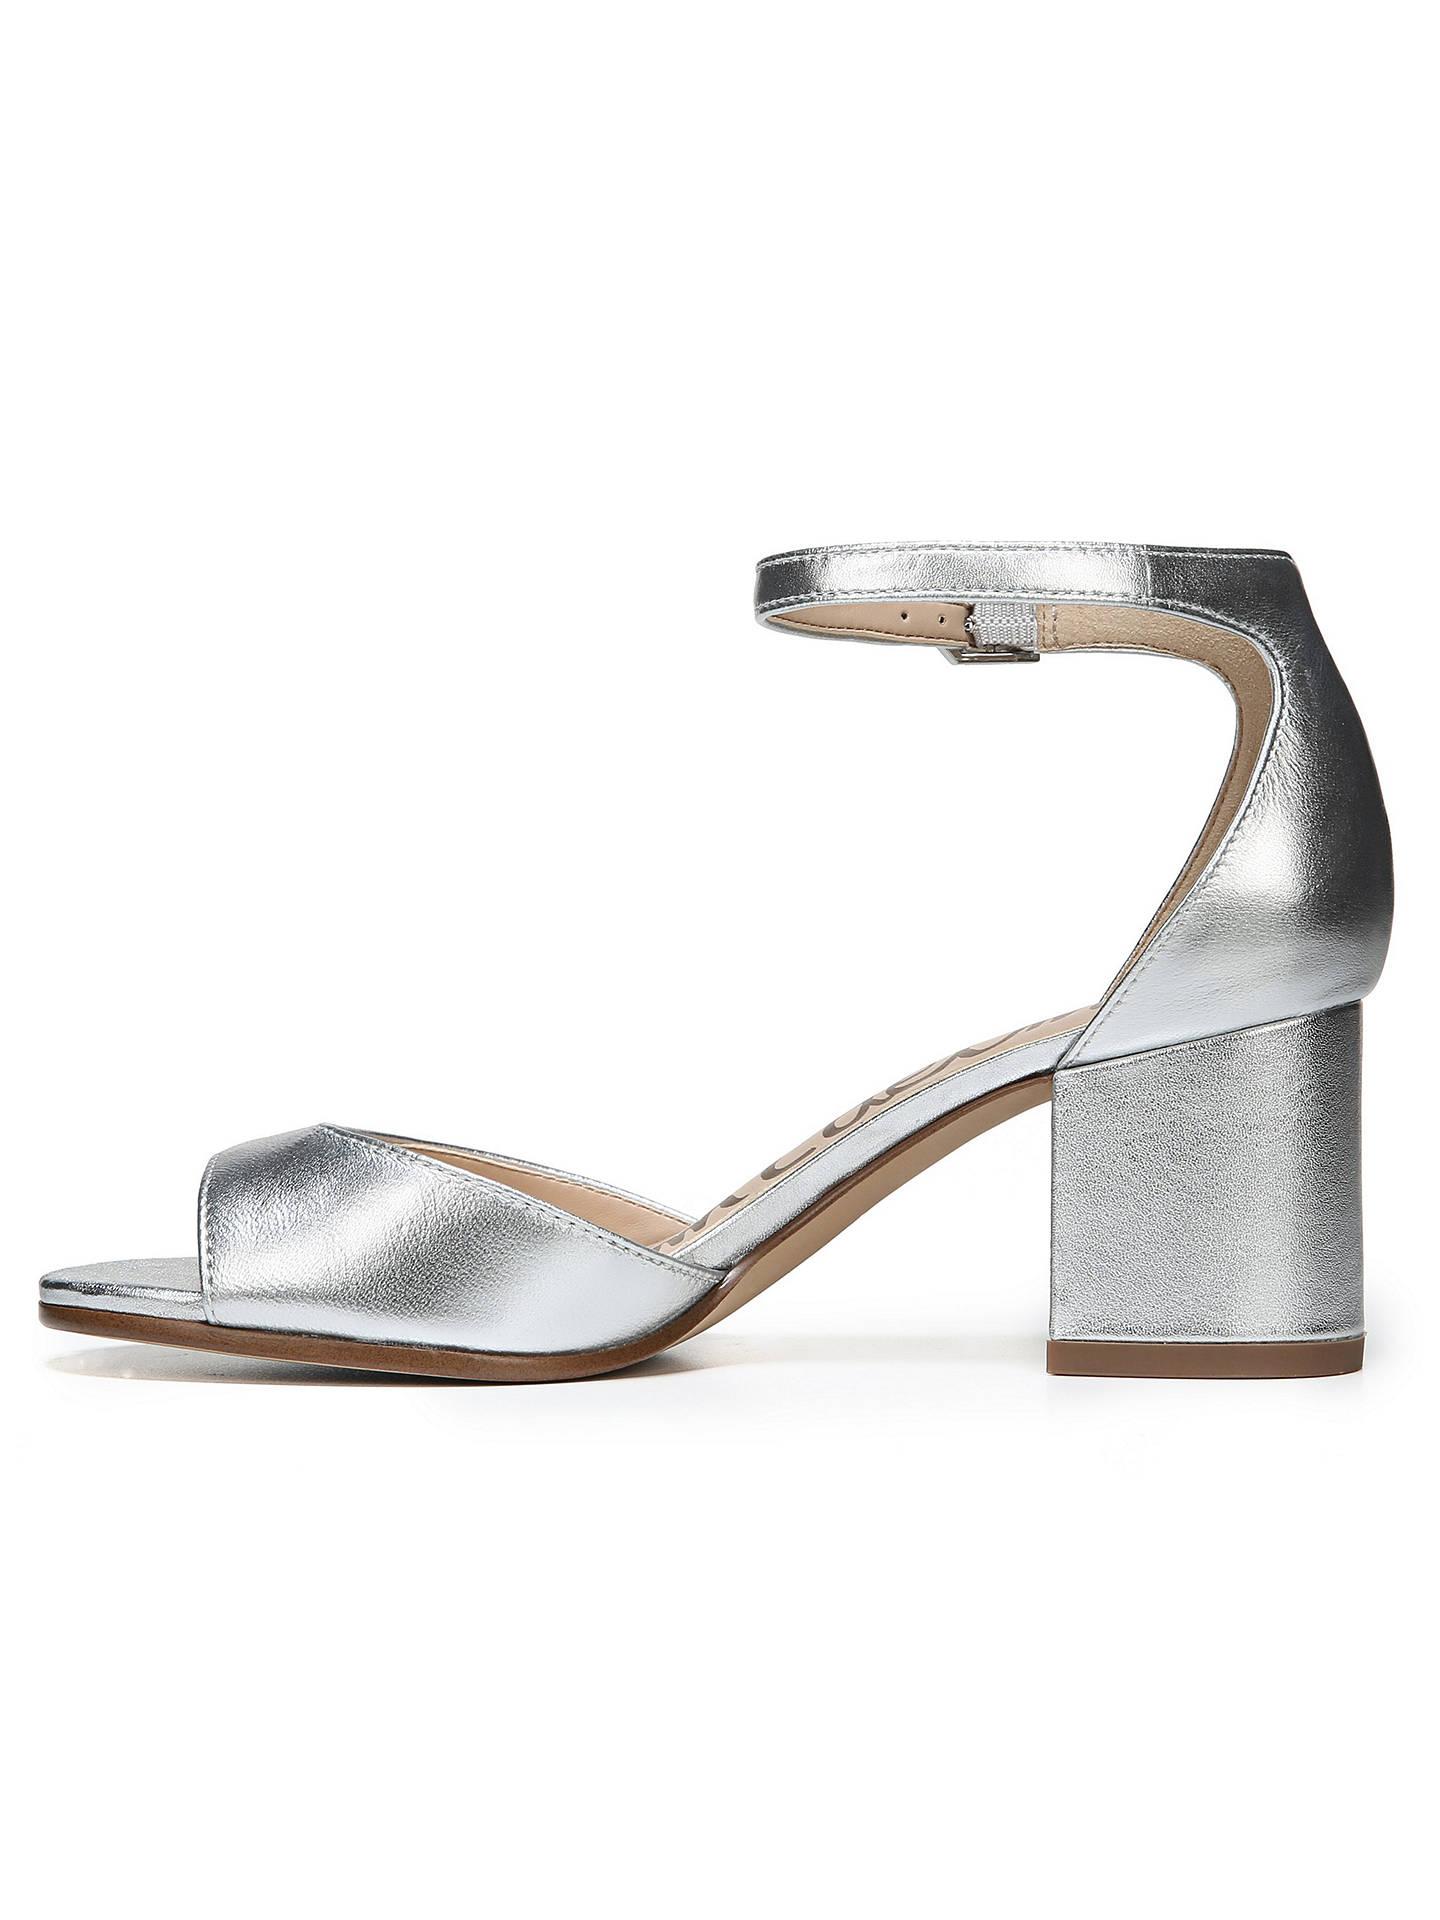 40767a56af209b Sam Edelman Susie Block Heeled Sandals at John Lewis   Partners